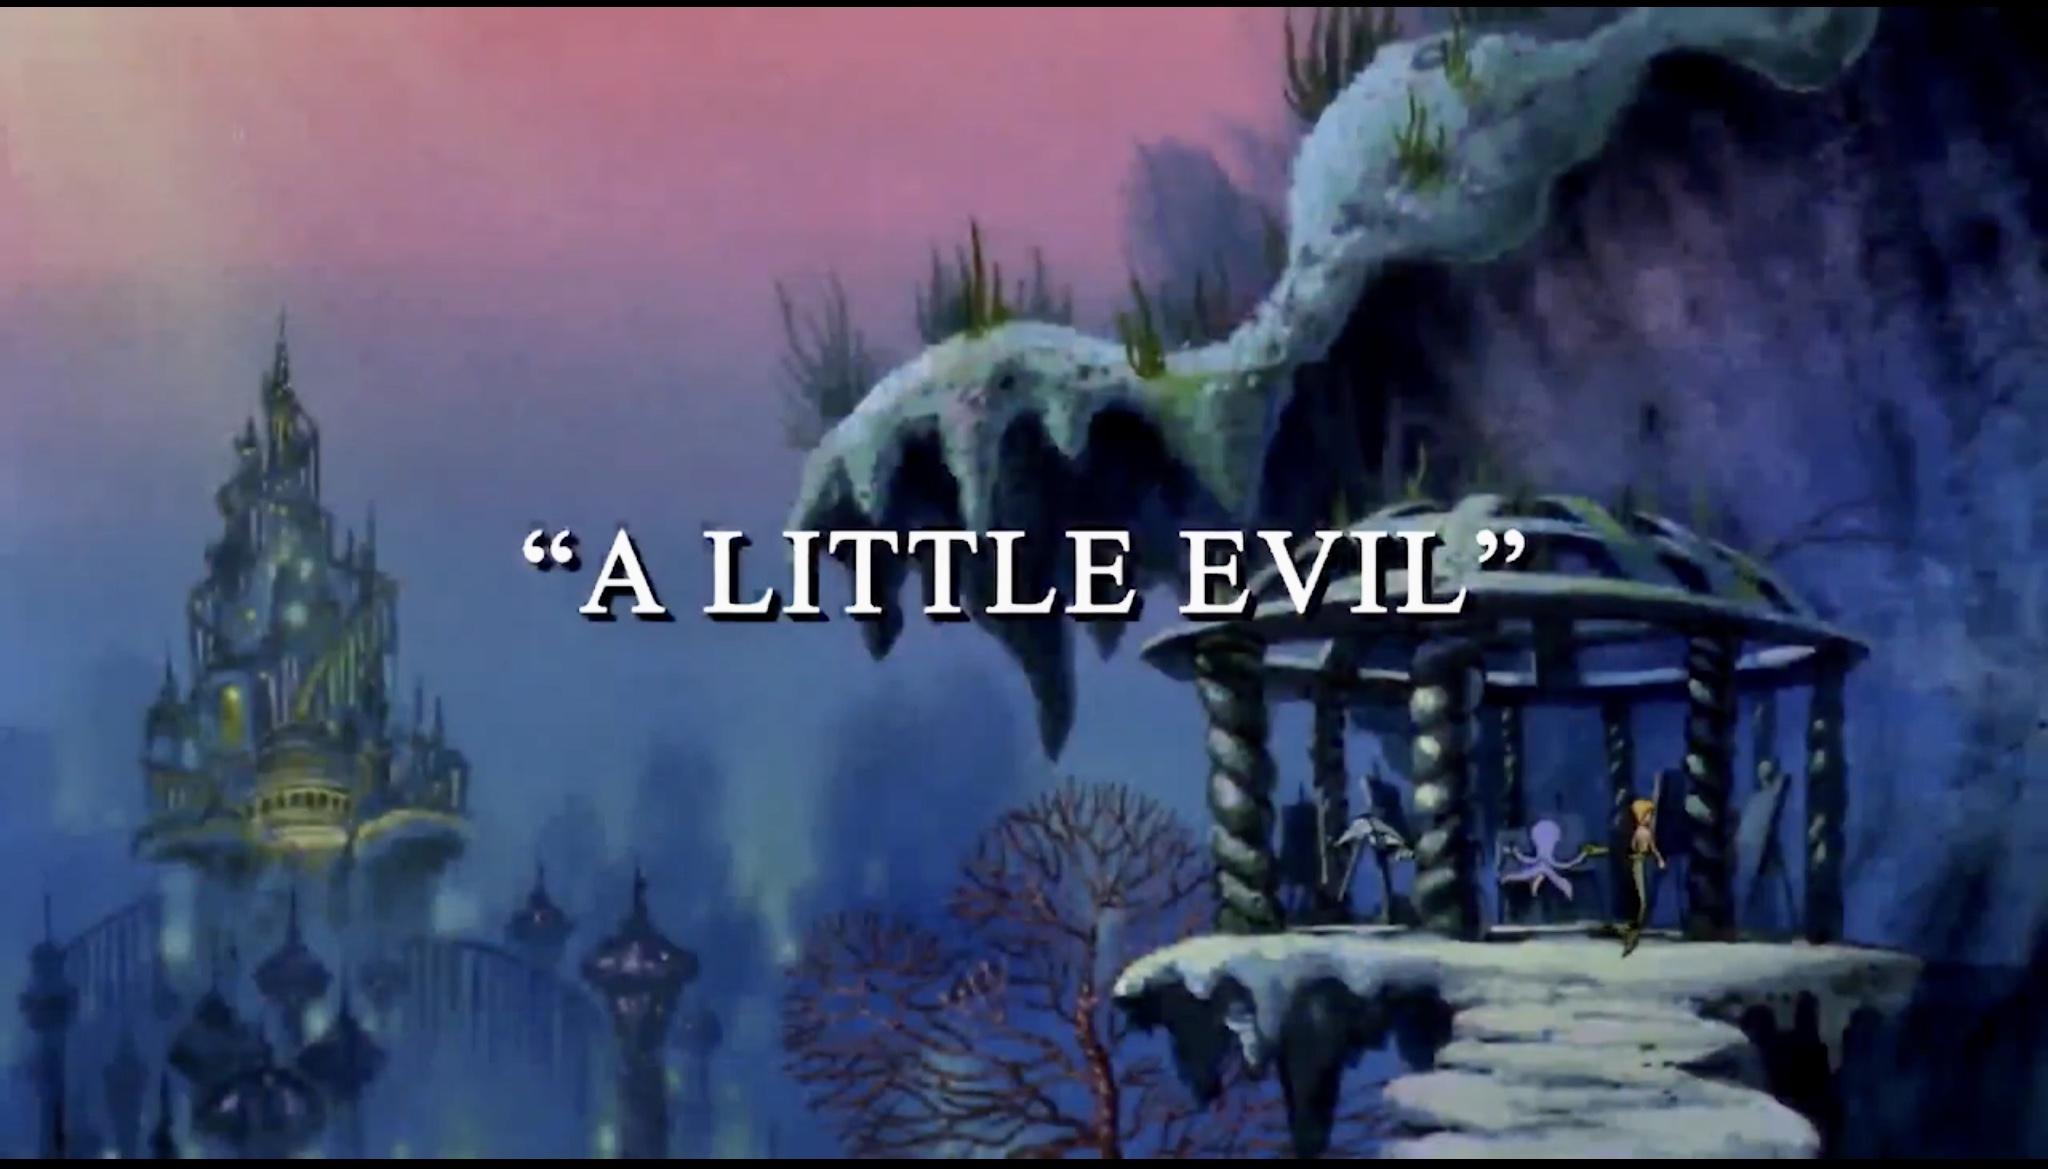 A Little Evil